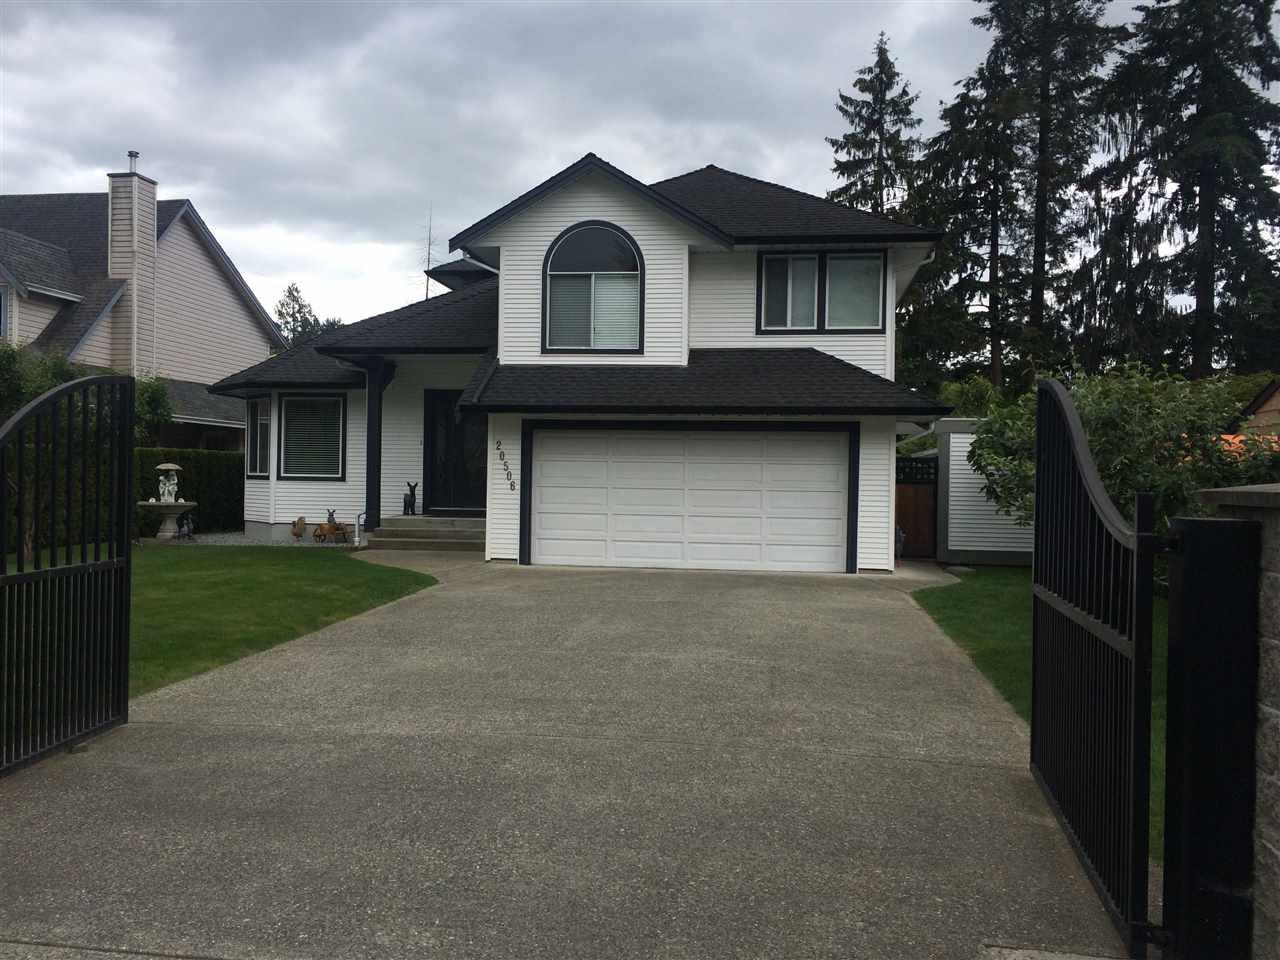 Main Photo: 20506 POWELL Avenue in Maple Ridge: Northwest Maple Ridge House for sale : MLS®# R2068466